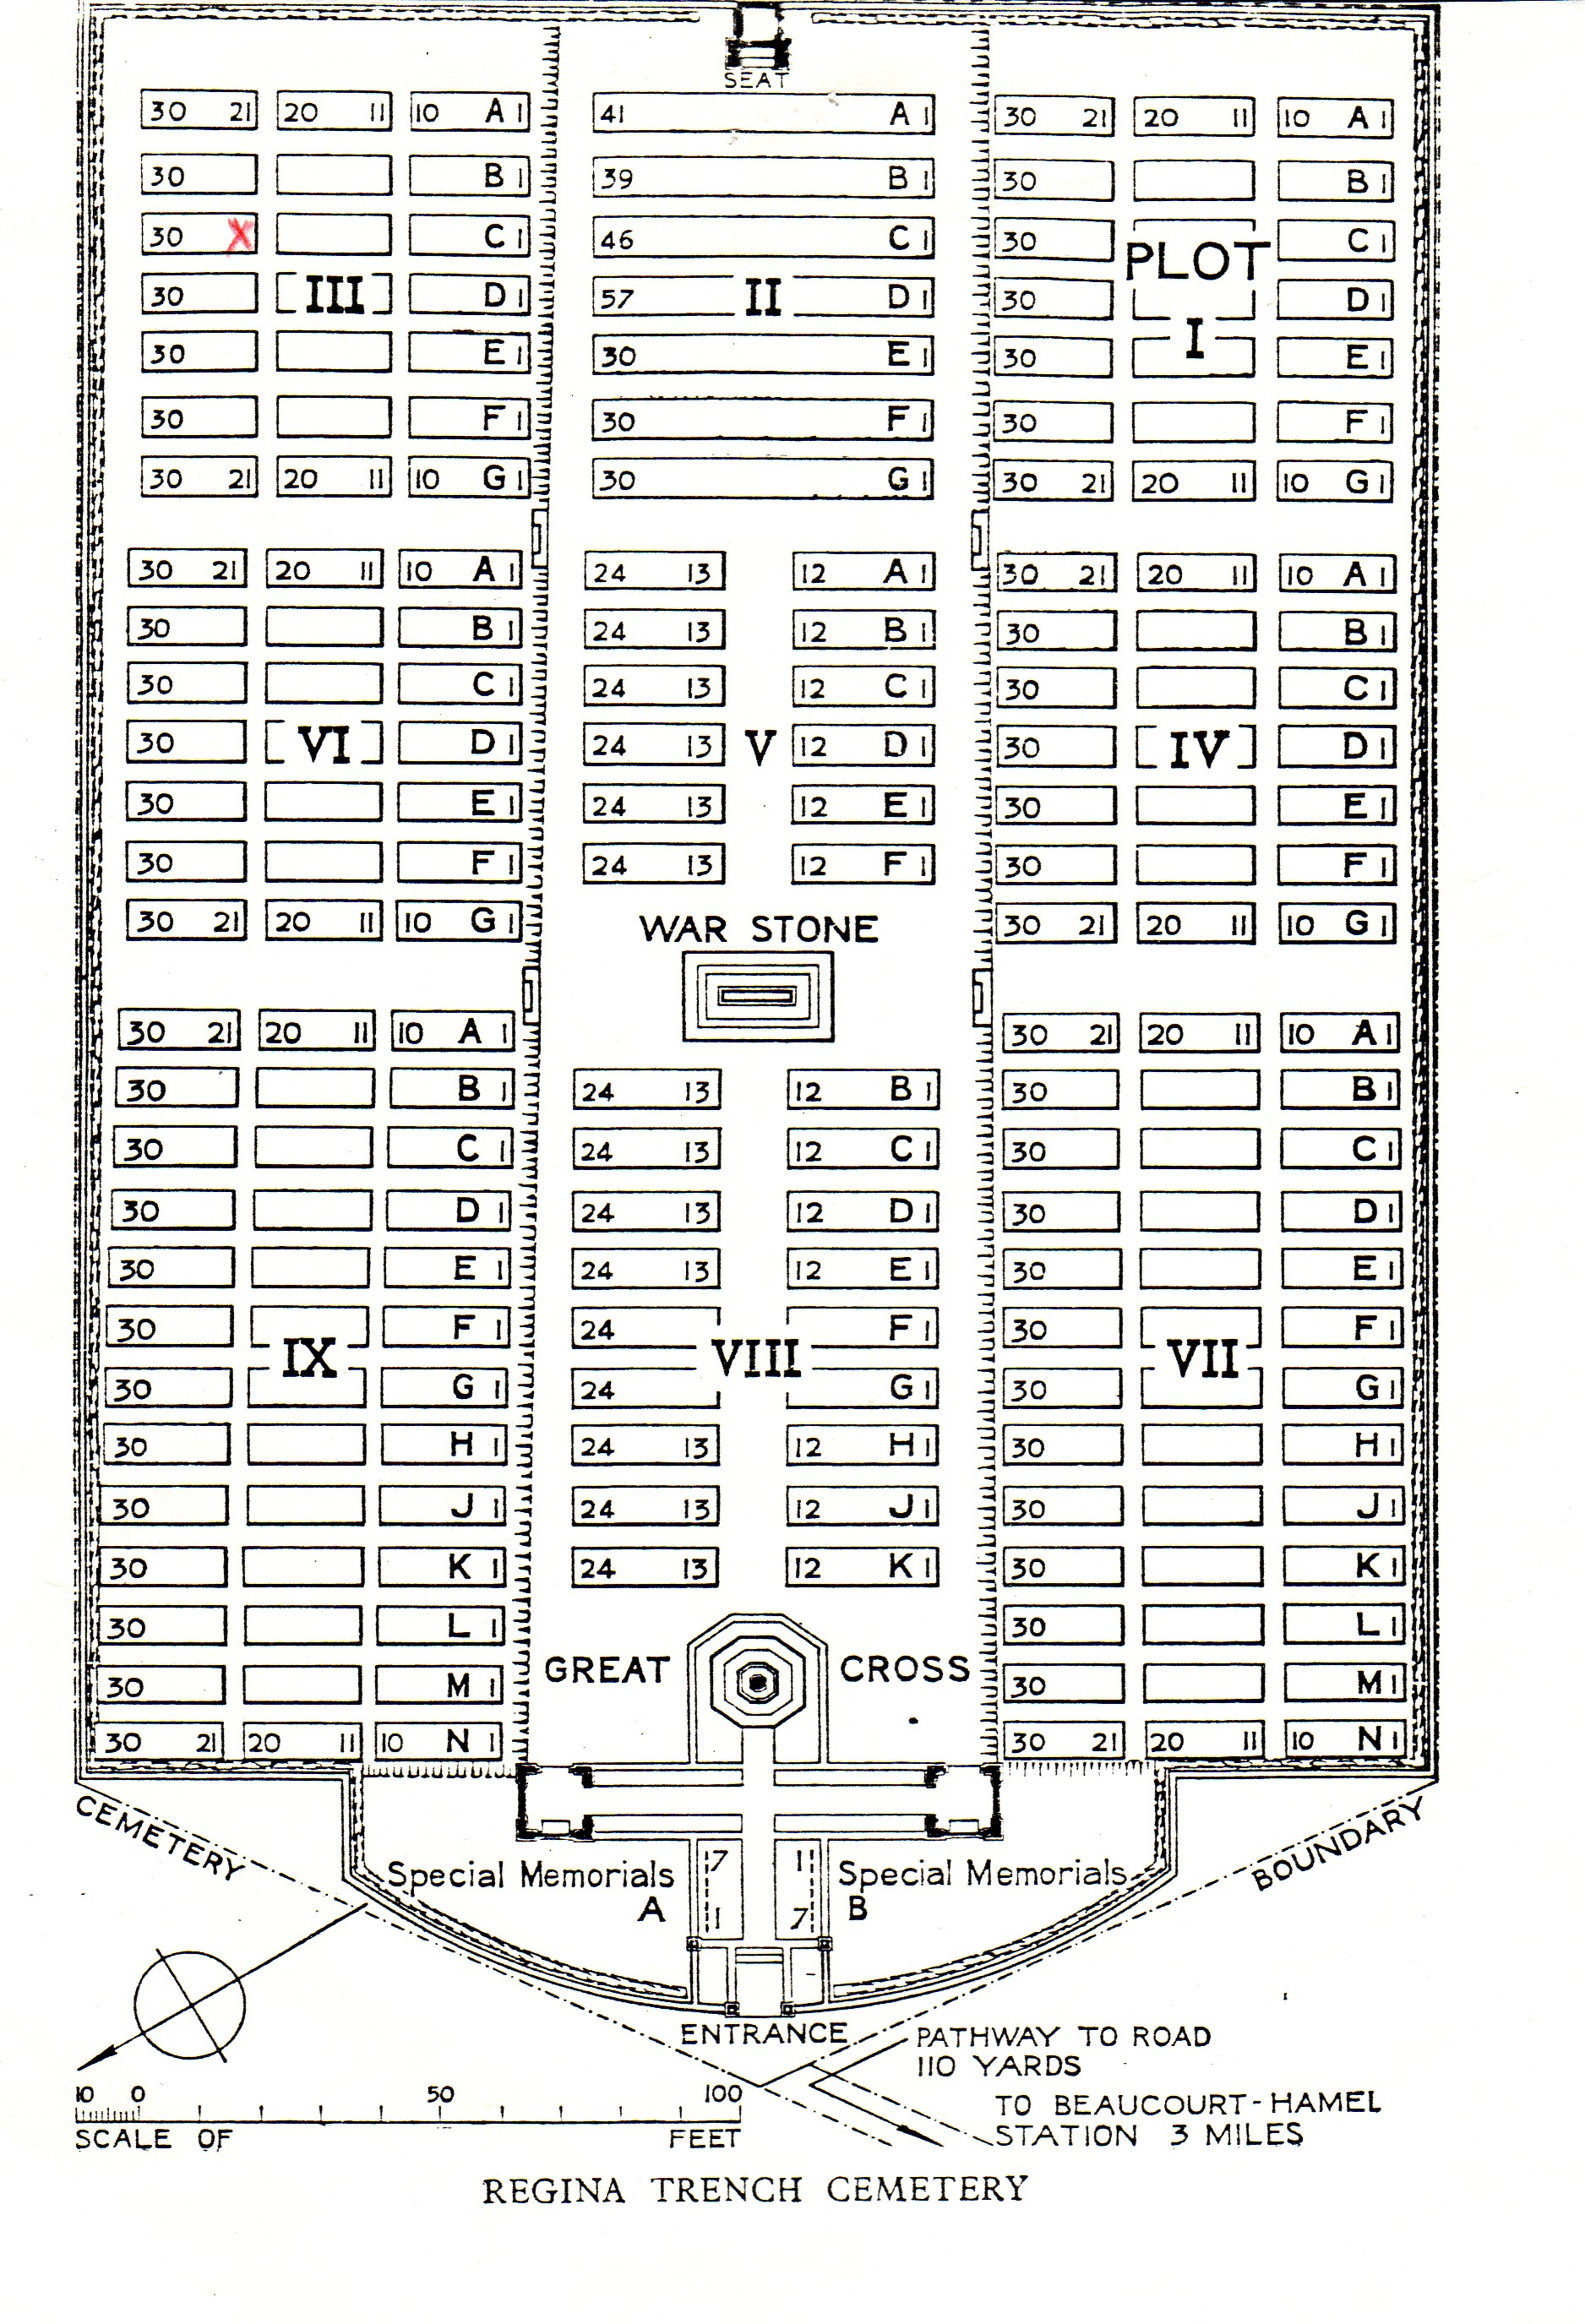 Dan Joe Malcolm Ww1 Notes 02 Wwi Trench Diagram Regina Cemetery